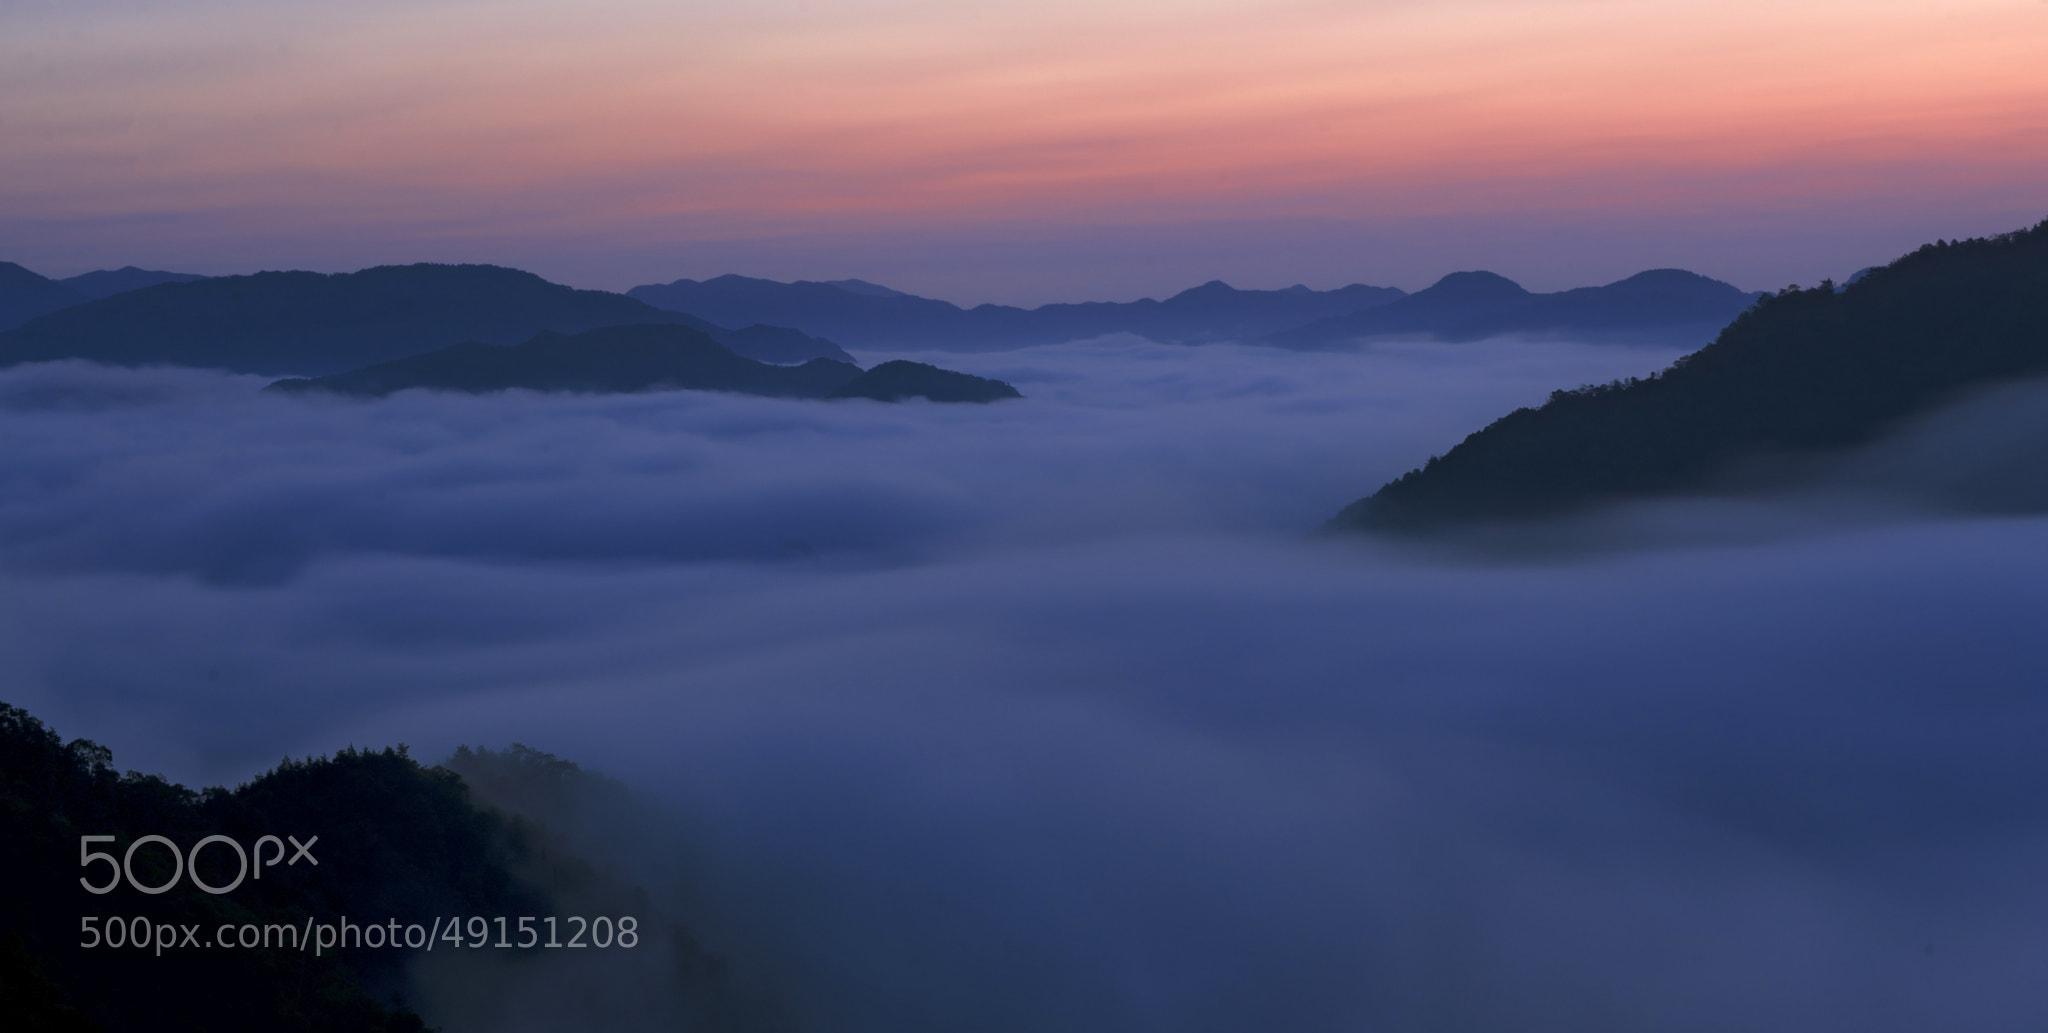 Photograph Cloudland by hugh dornan on 500px